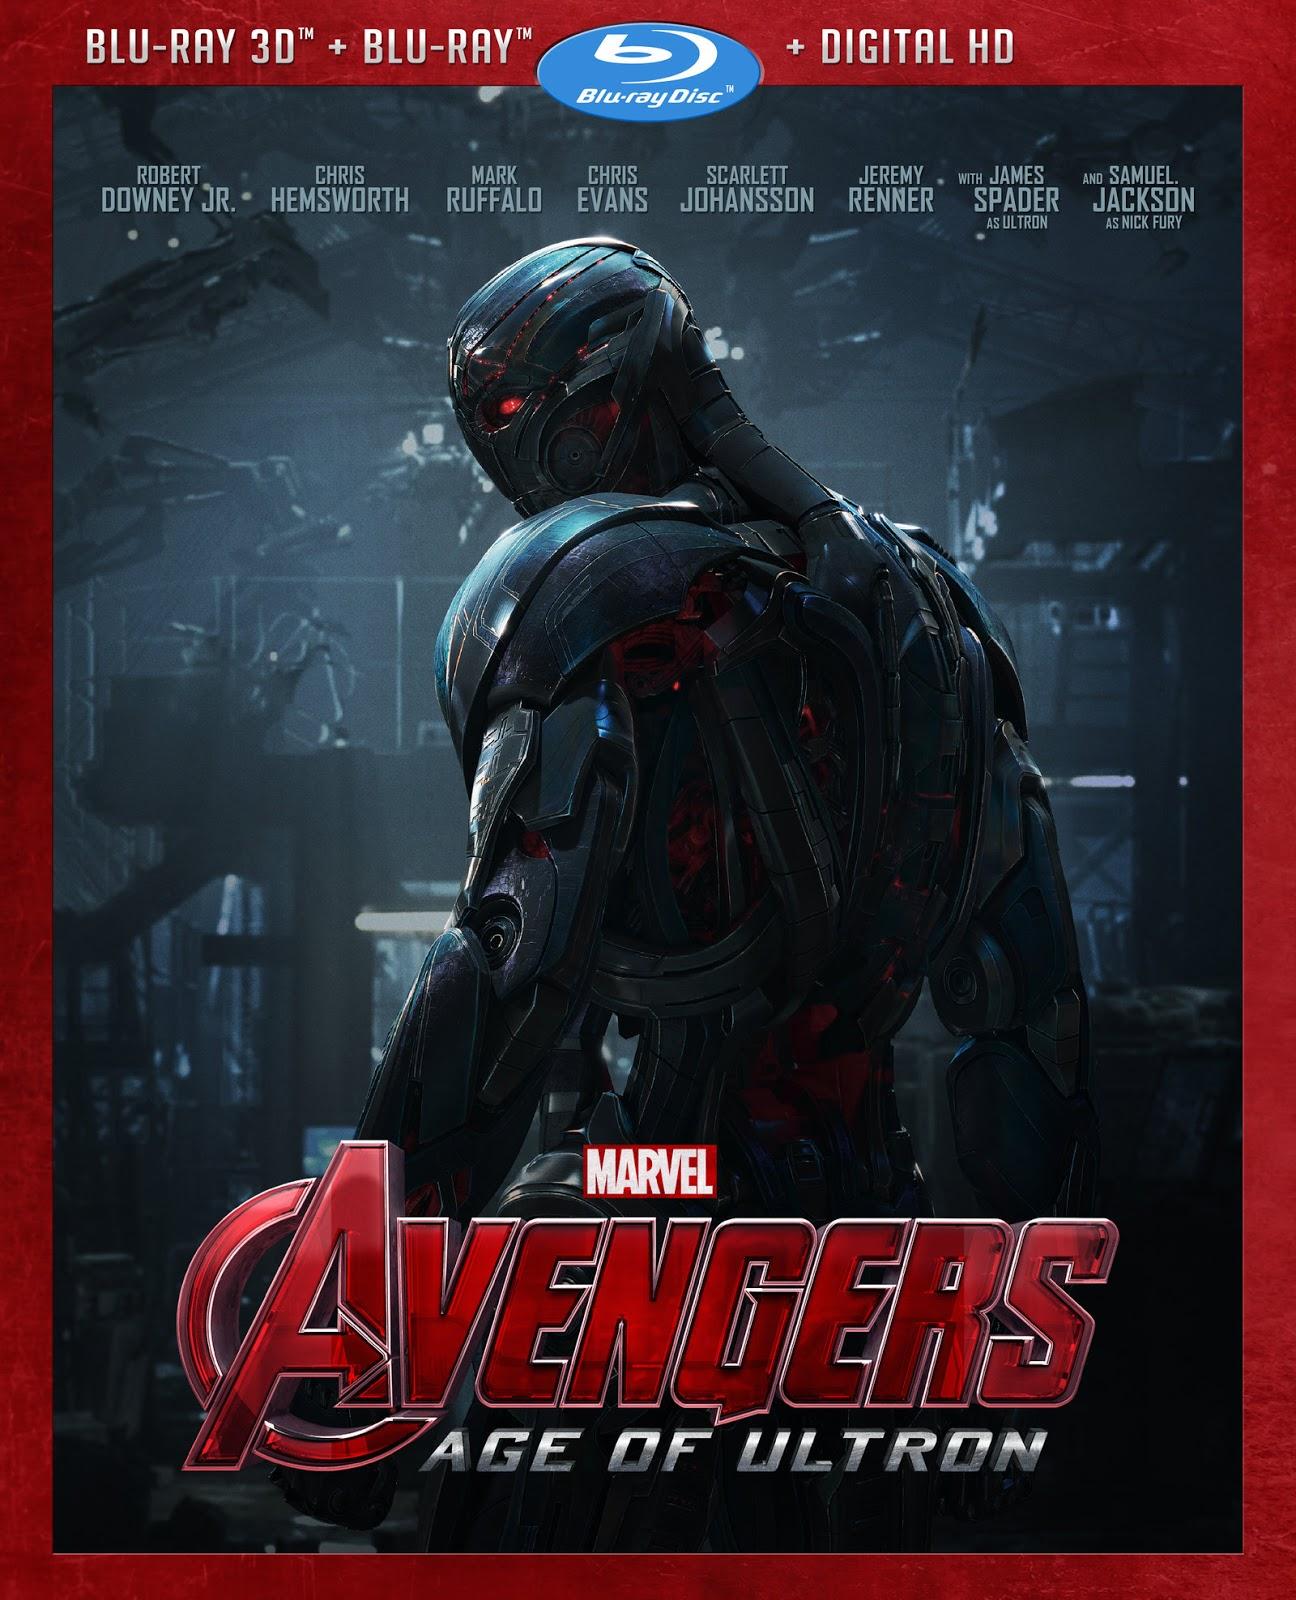 Avengers Era de Ultron (2015) 1080p BD25 3D Cover Caratula